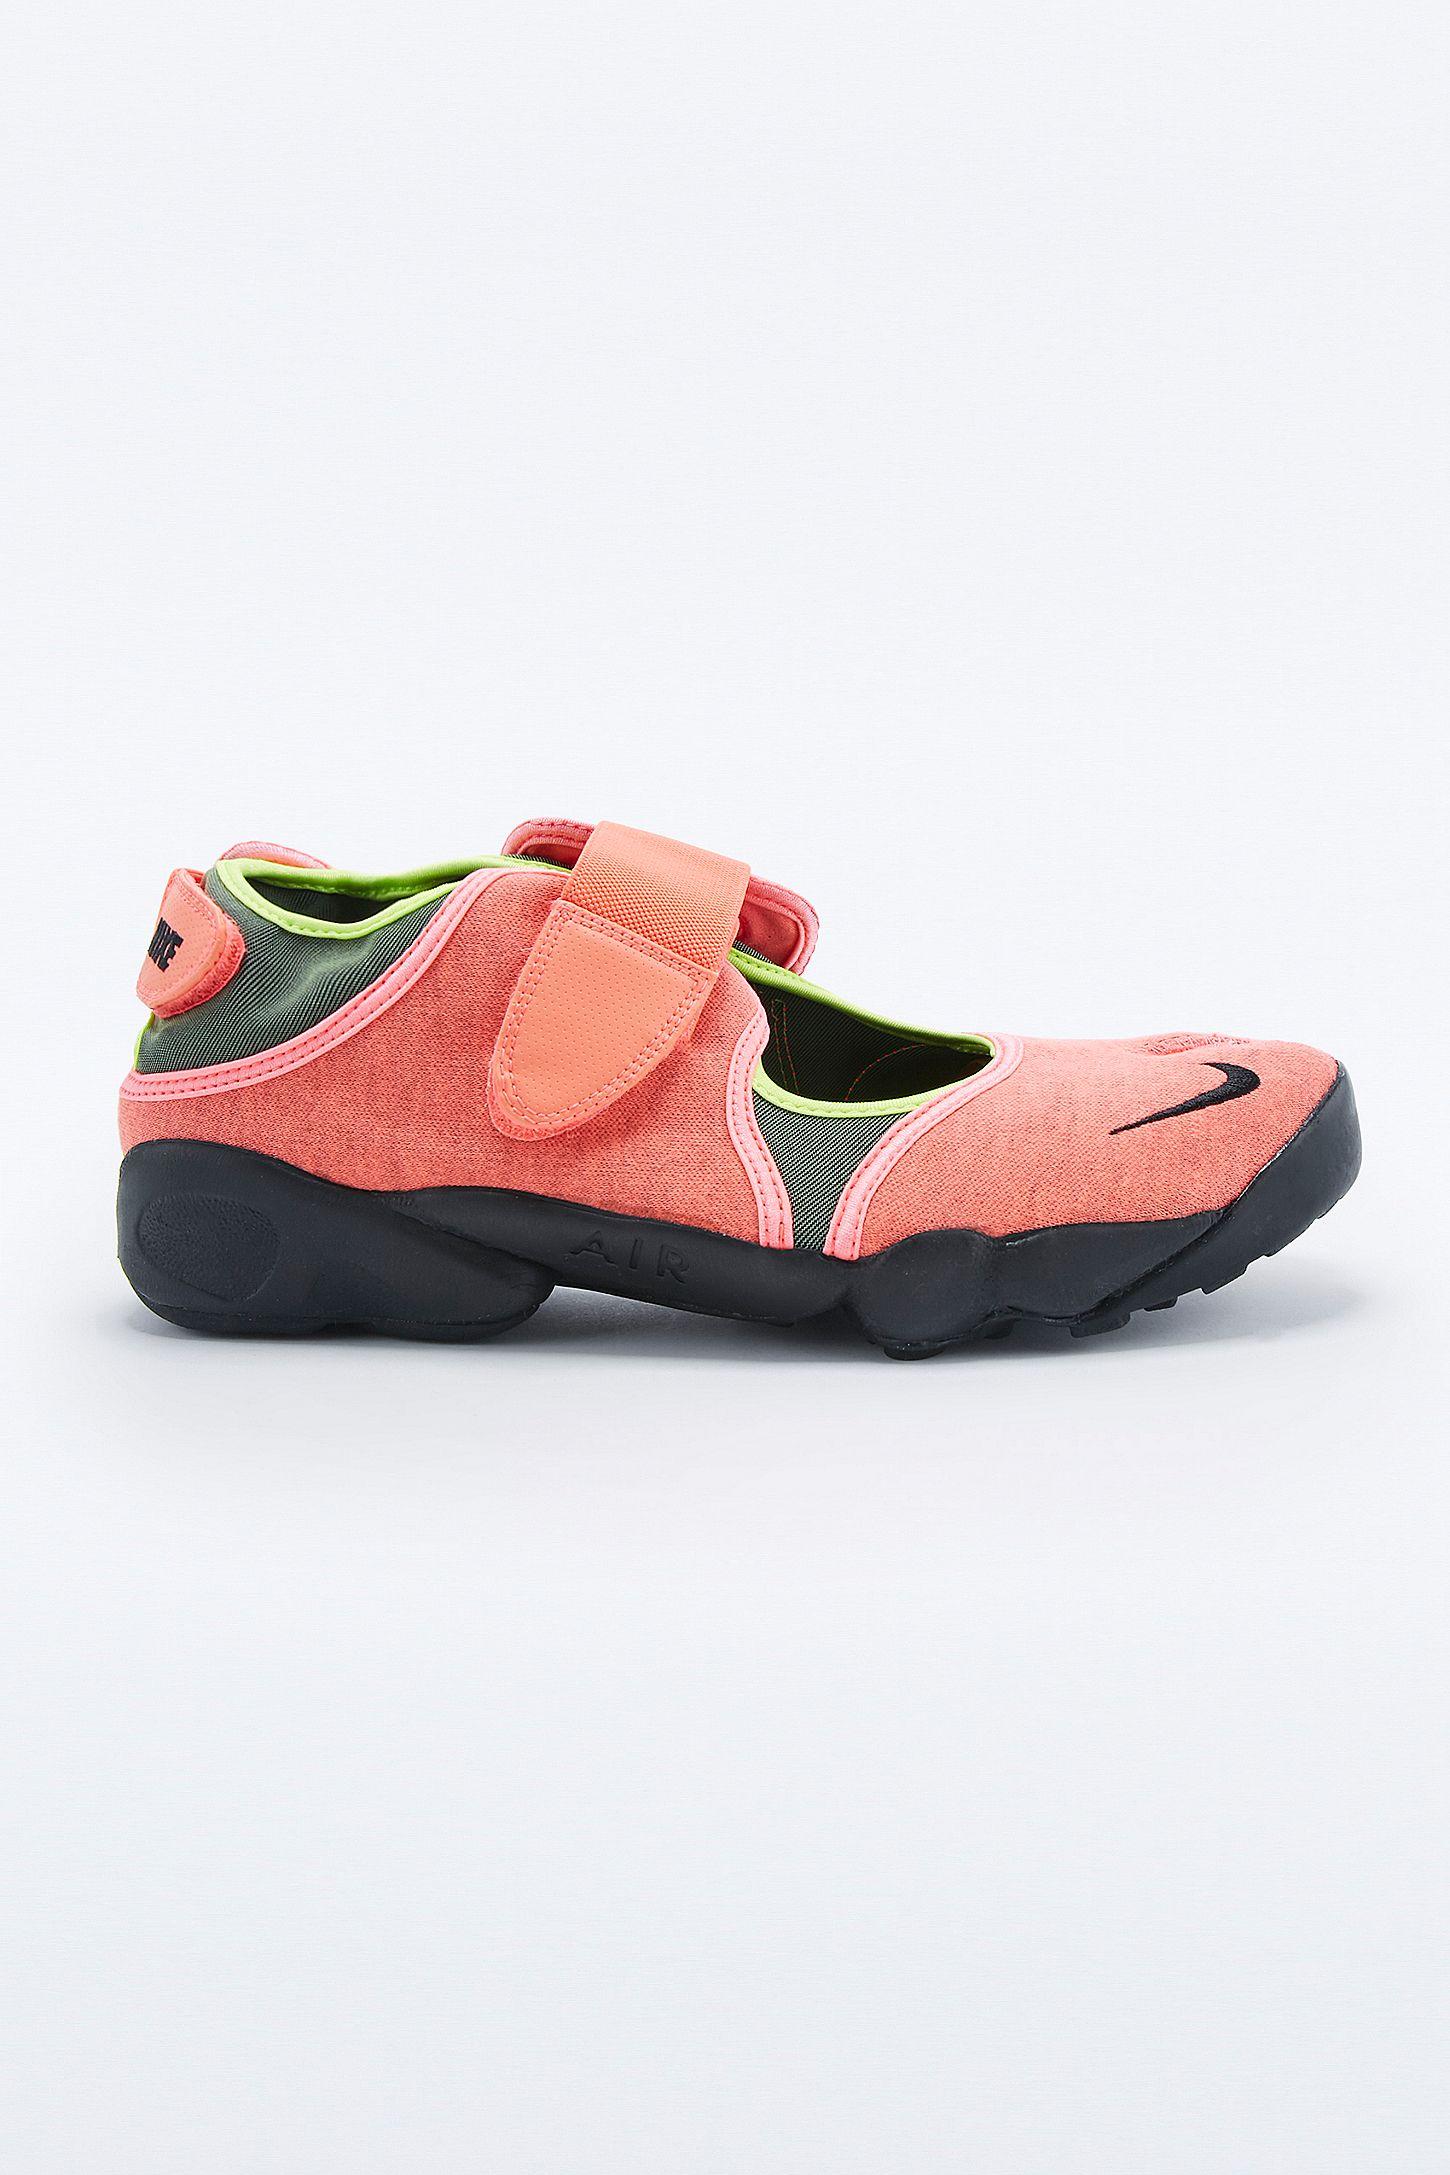 fbf0aff0f12b Nike Air Rift Trainers in Hot Lava